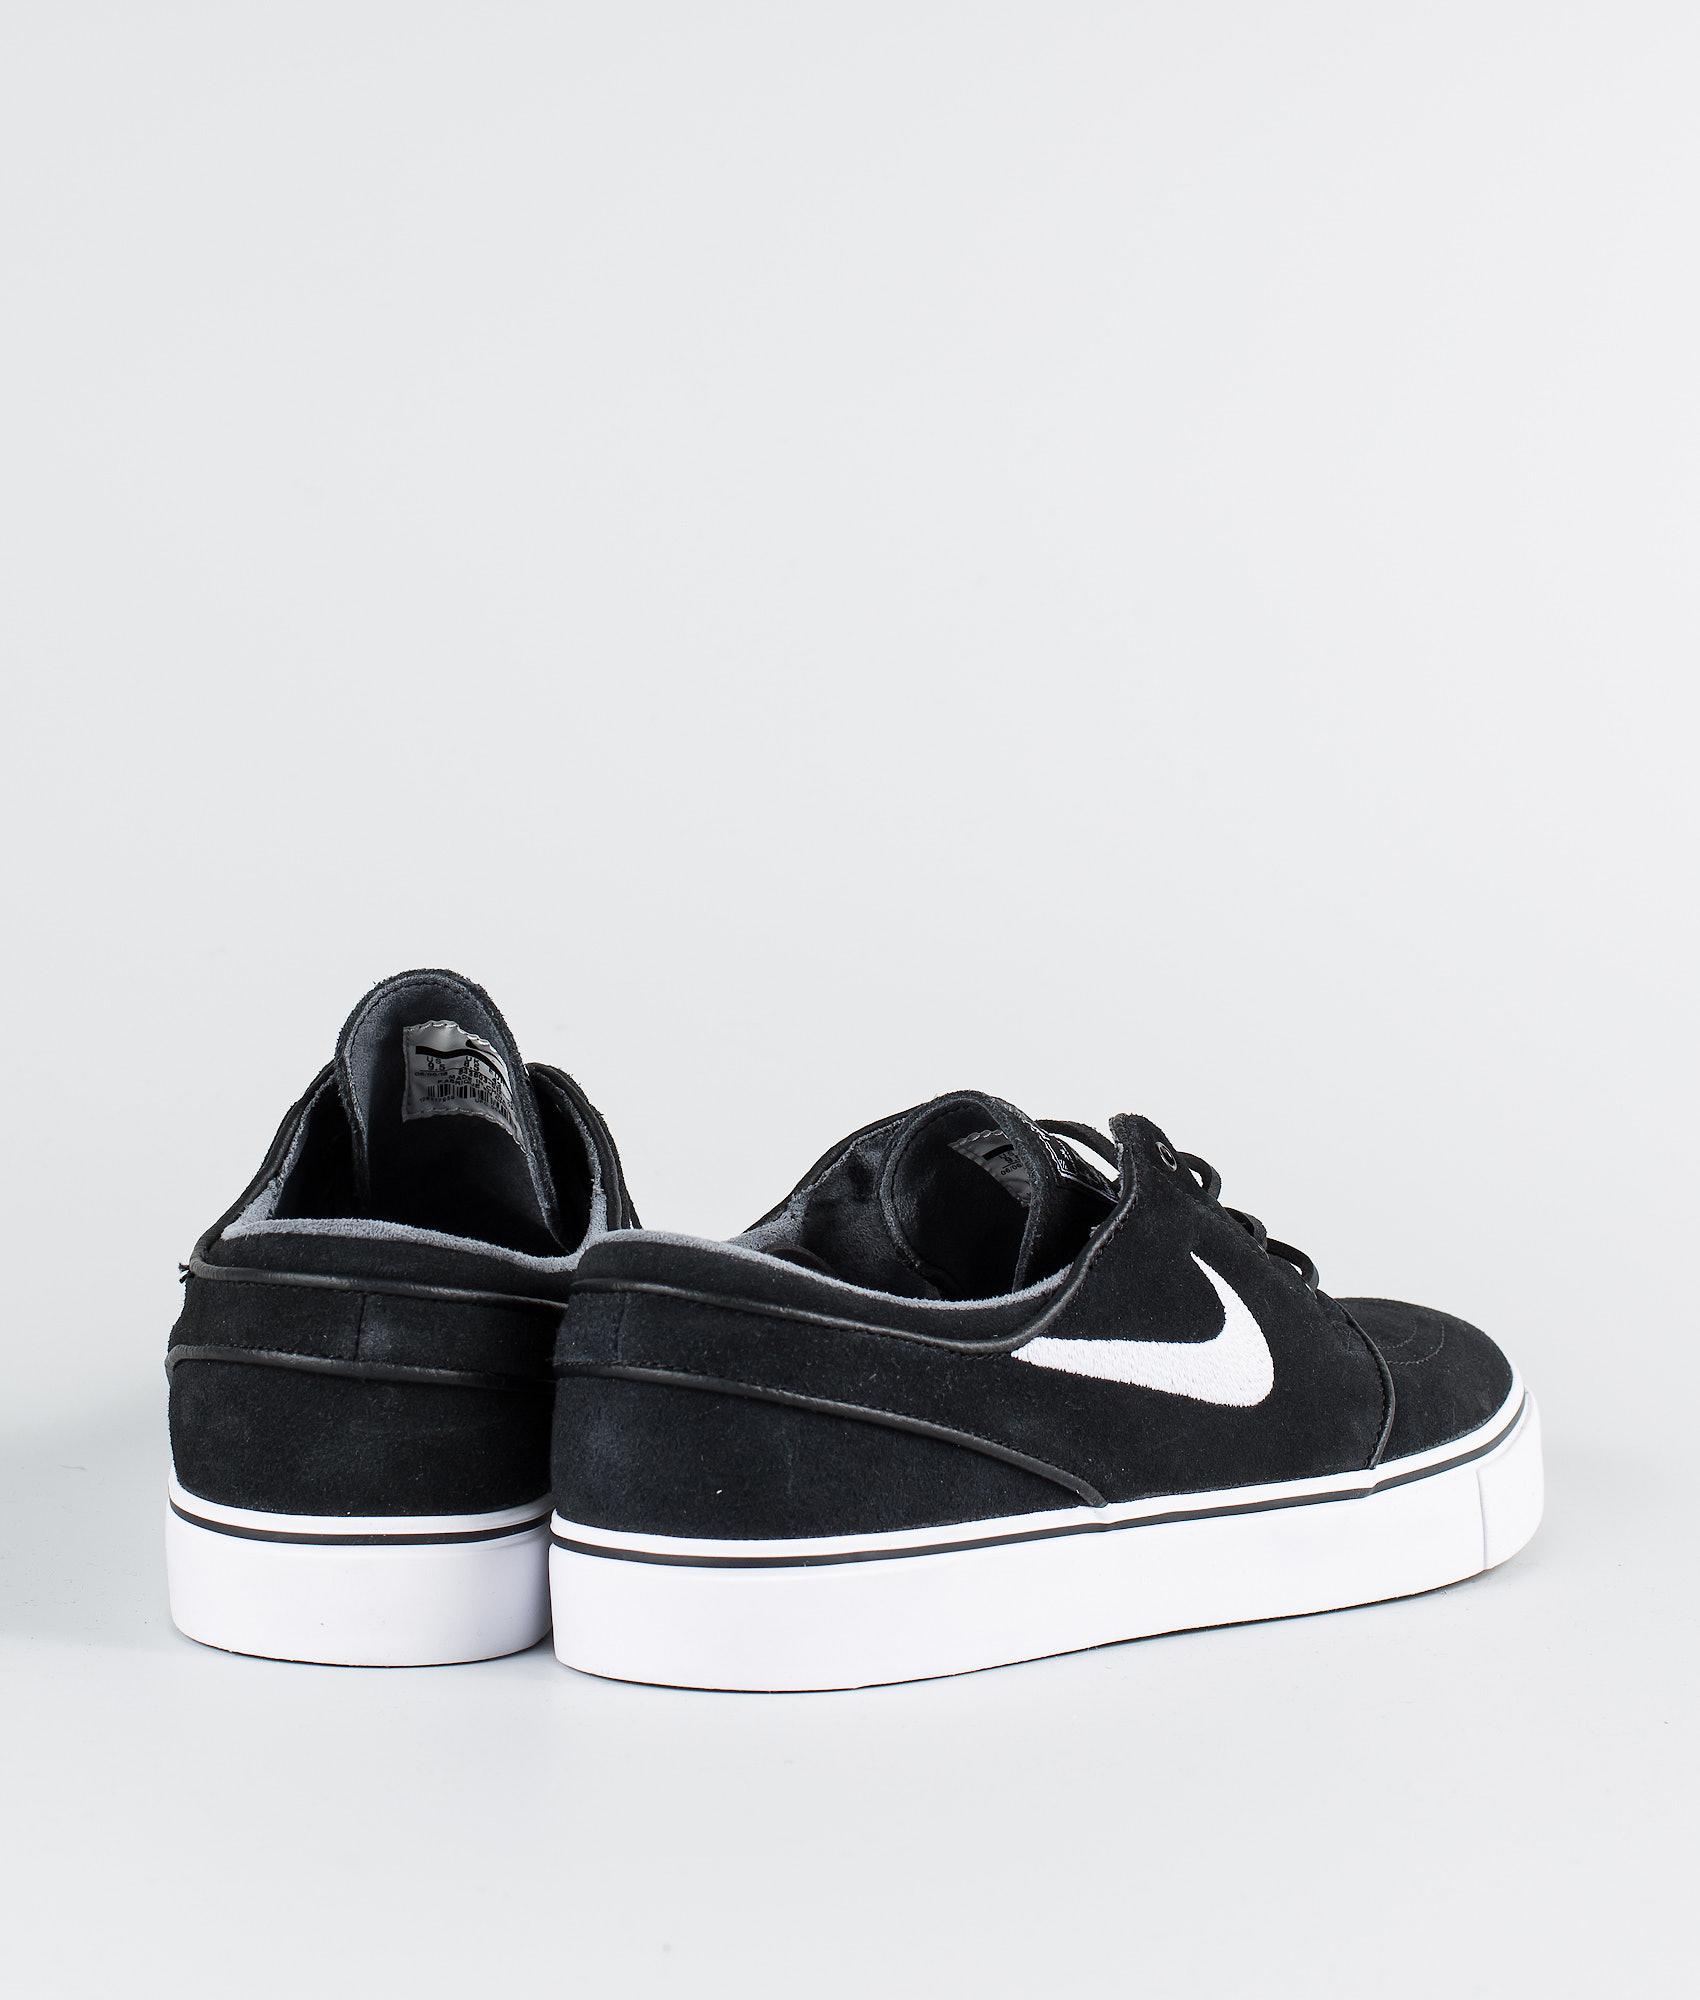 promo code 23a47 8c4cc Nike Zoom Stefan Janoski Og Shoes